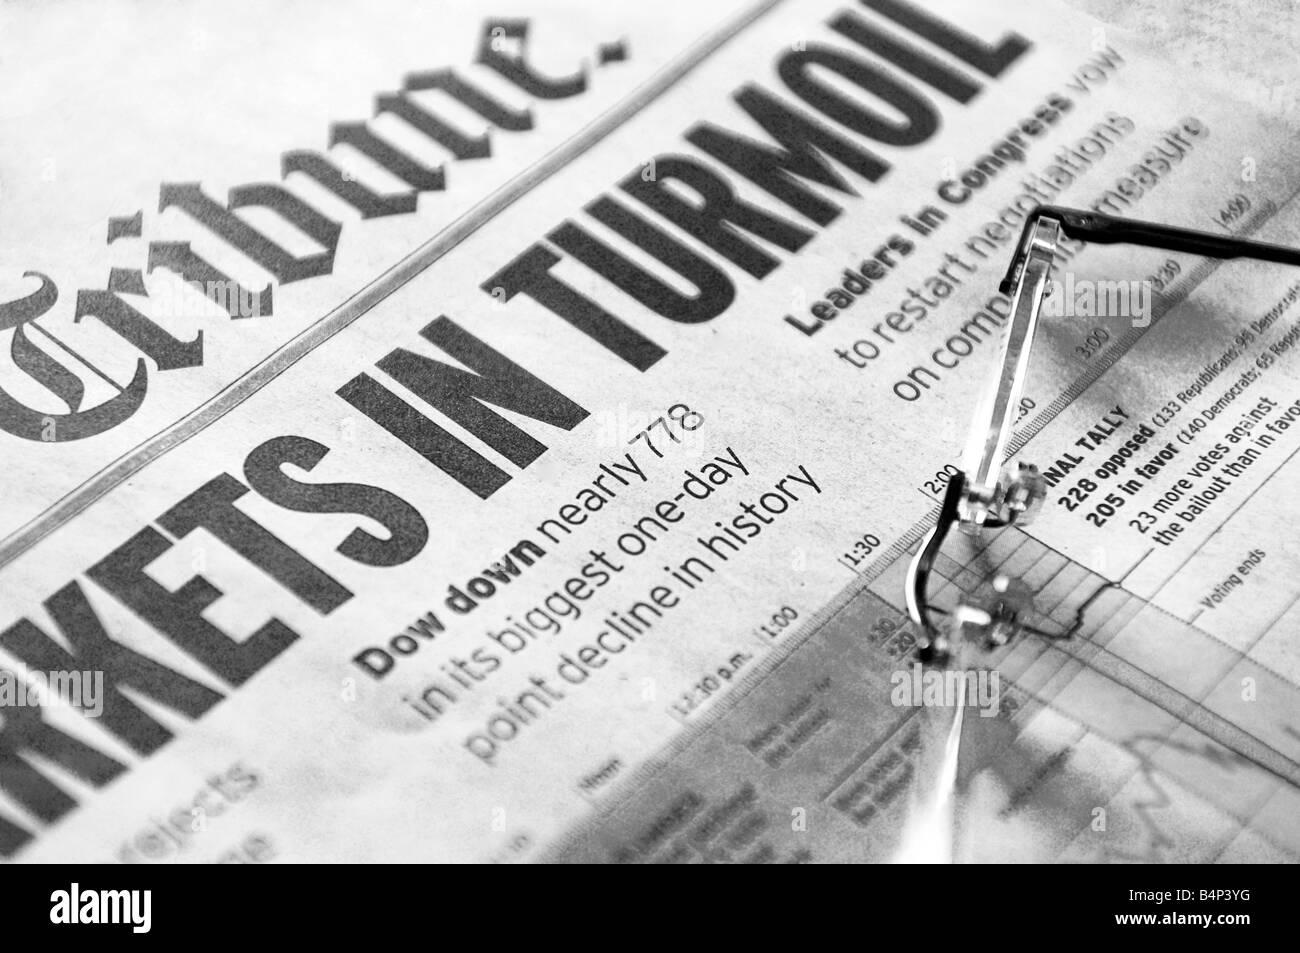 Markets In Turmoil - stock market headlines - Stock Image